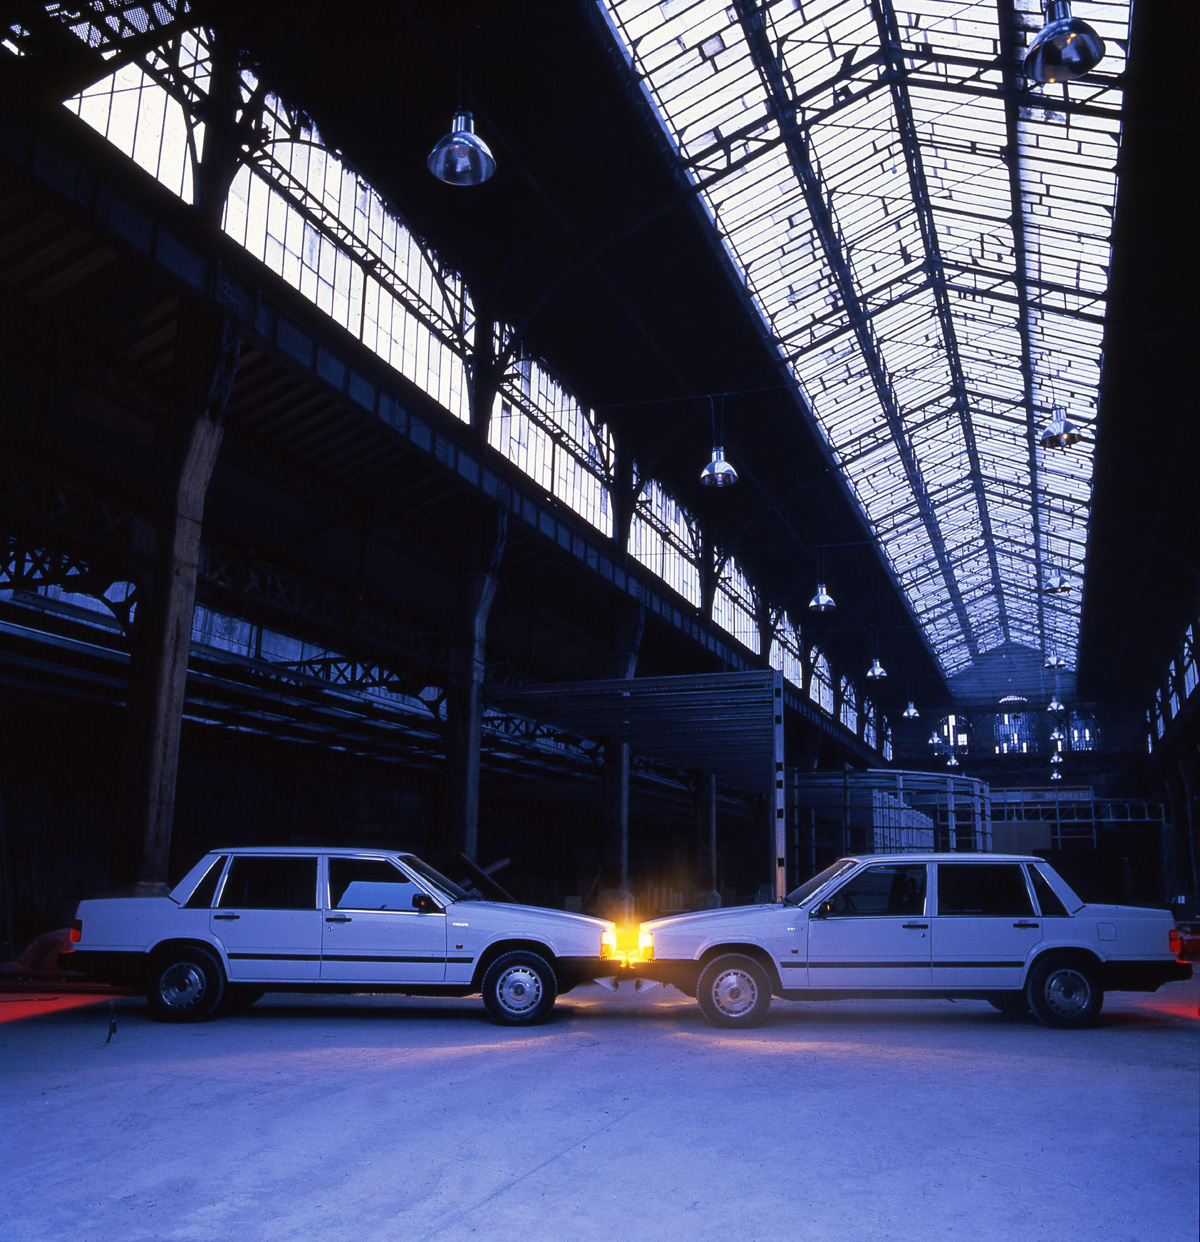 Ange Leccia, Volvo, arrangement, 1986. Installation view in Le Magasin, Grenoble, France Almine Rech Gallery, Paris, Bruxelles © Ange Leccia ADAGP